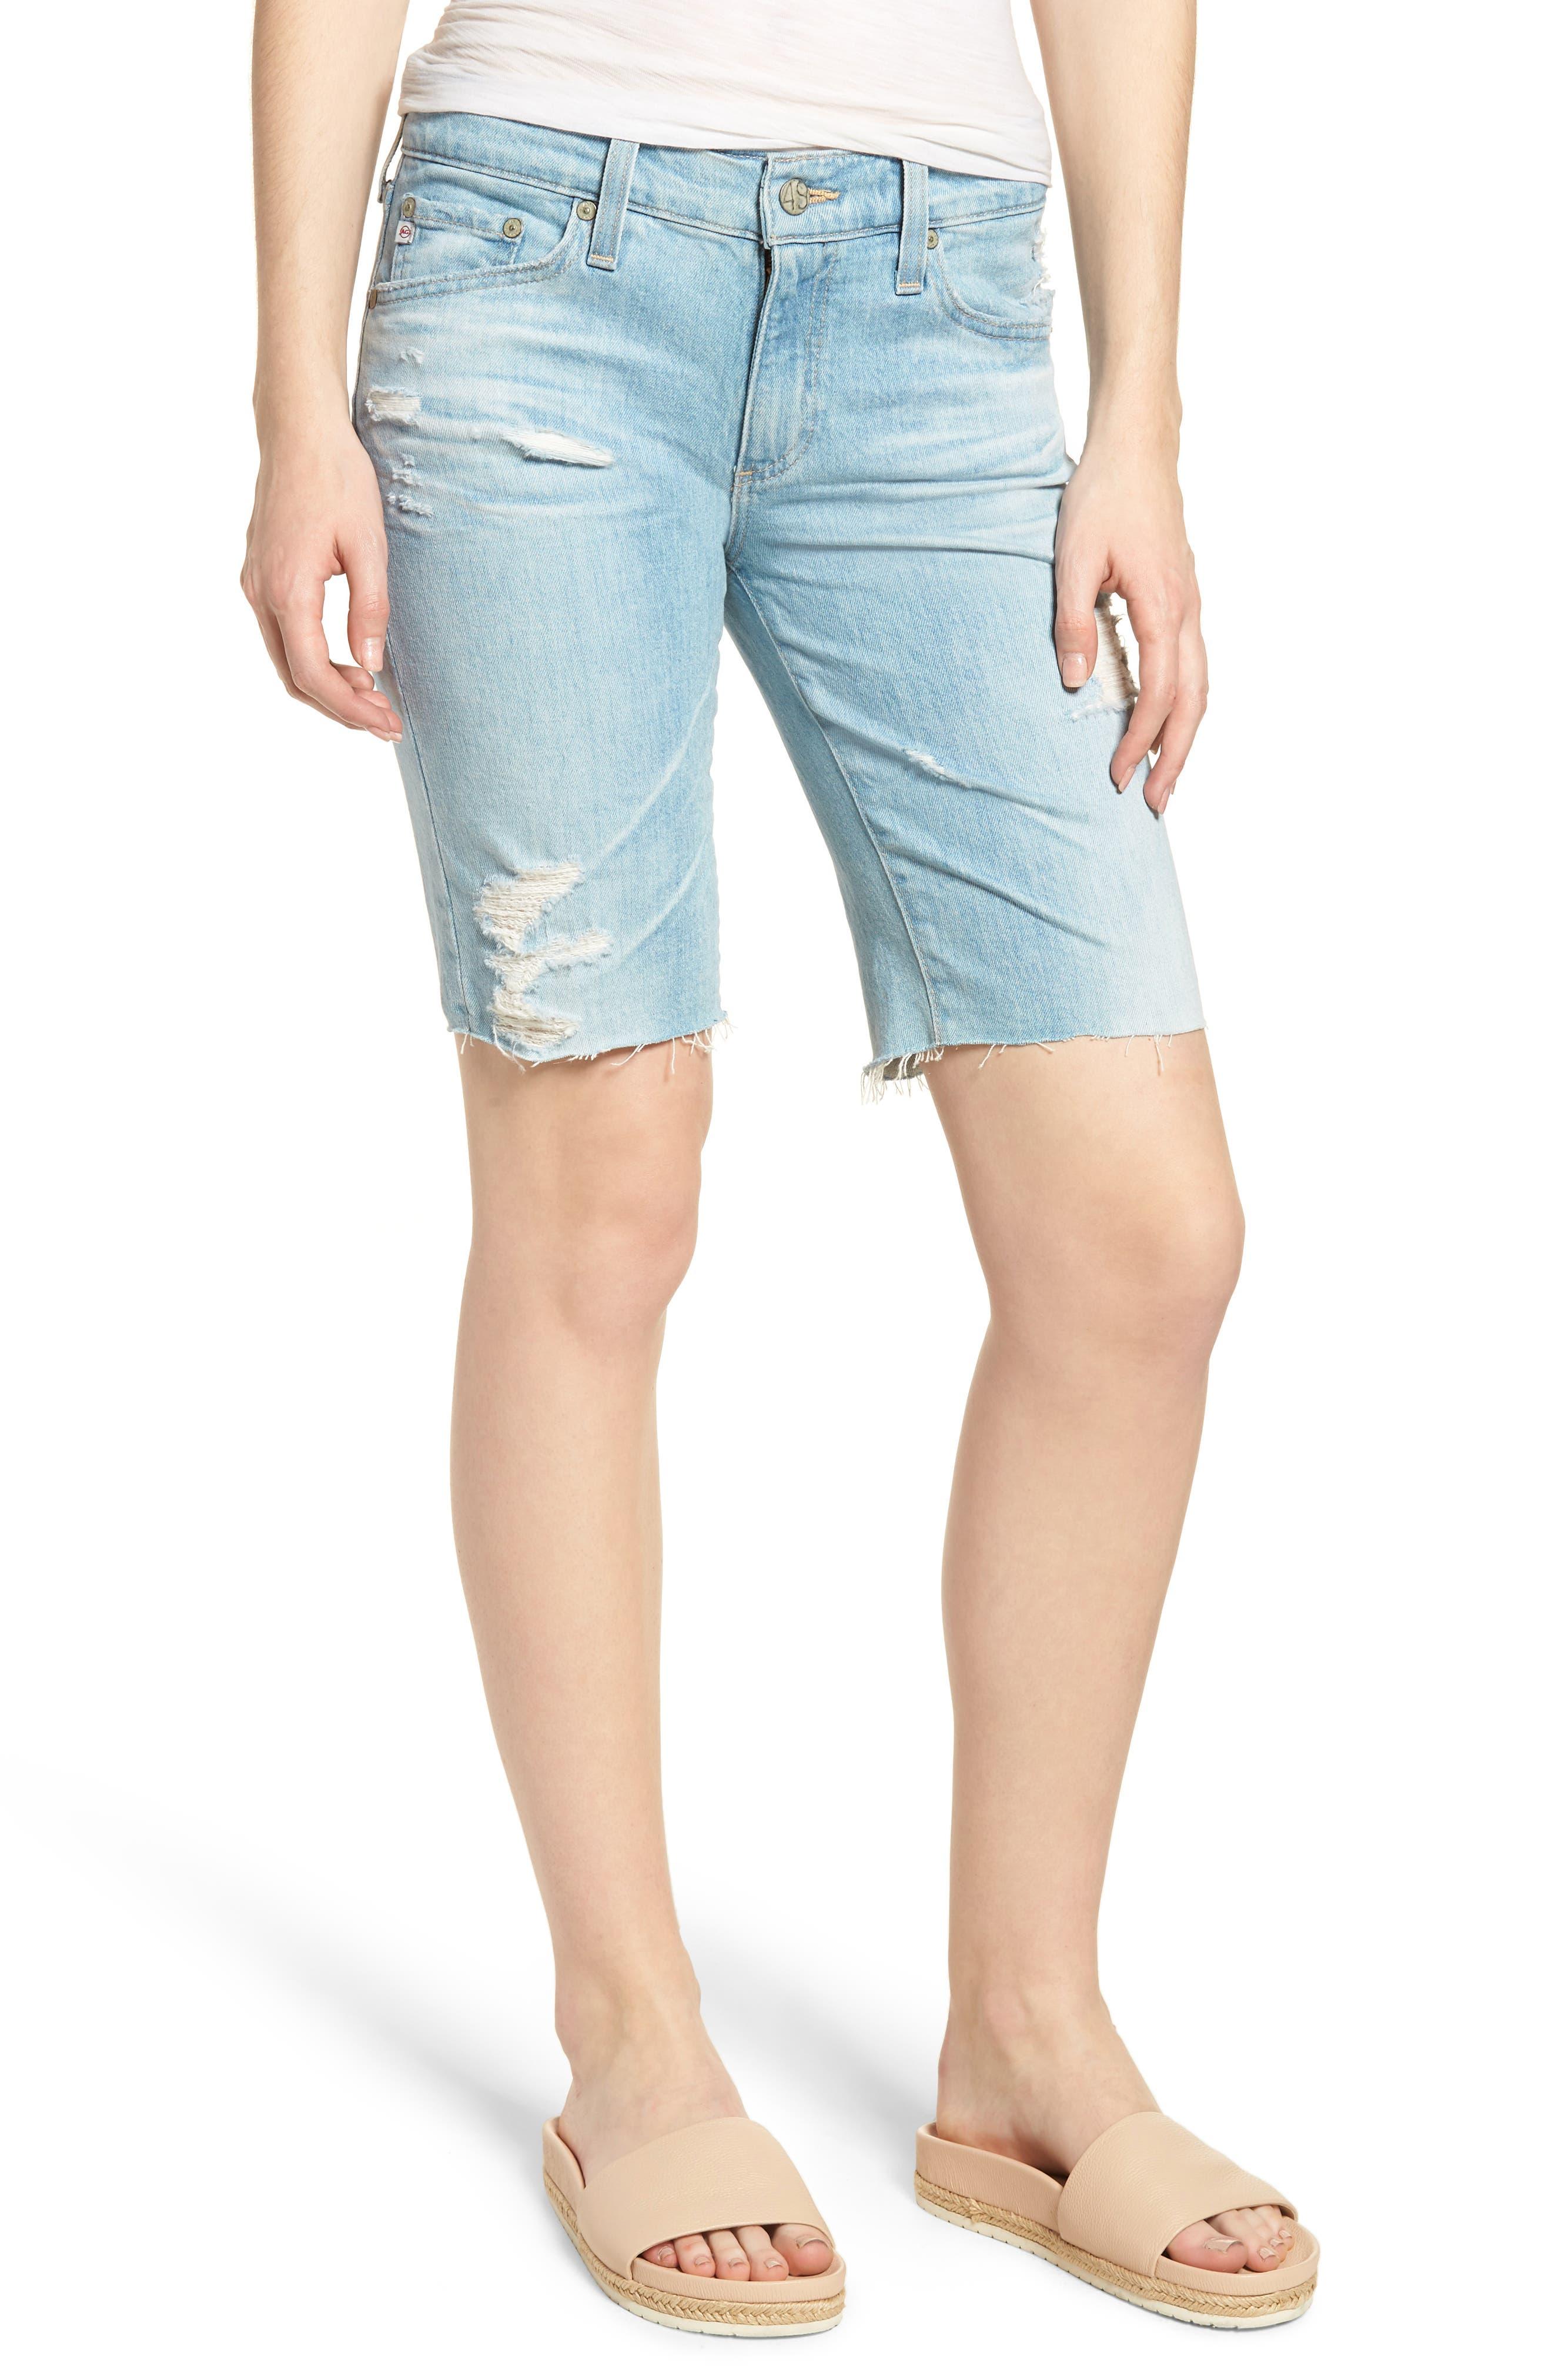 Nikki Denim Shorts,                         Main,                         color, 23 Years Cerulean Chase